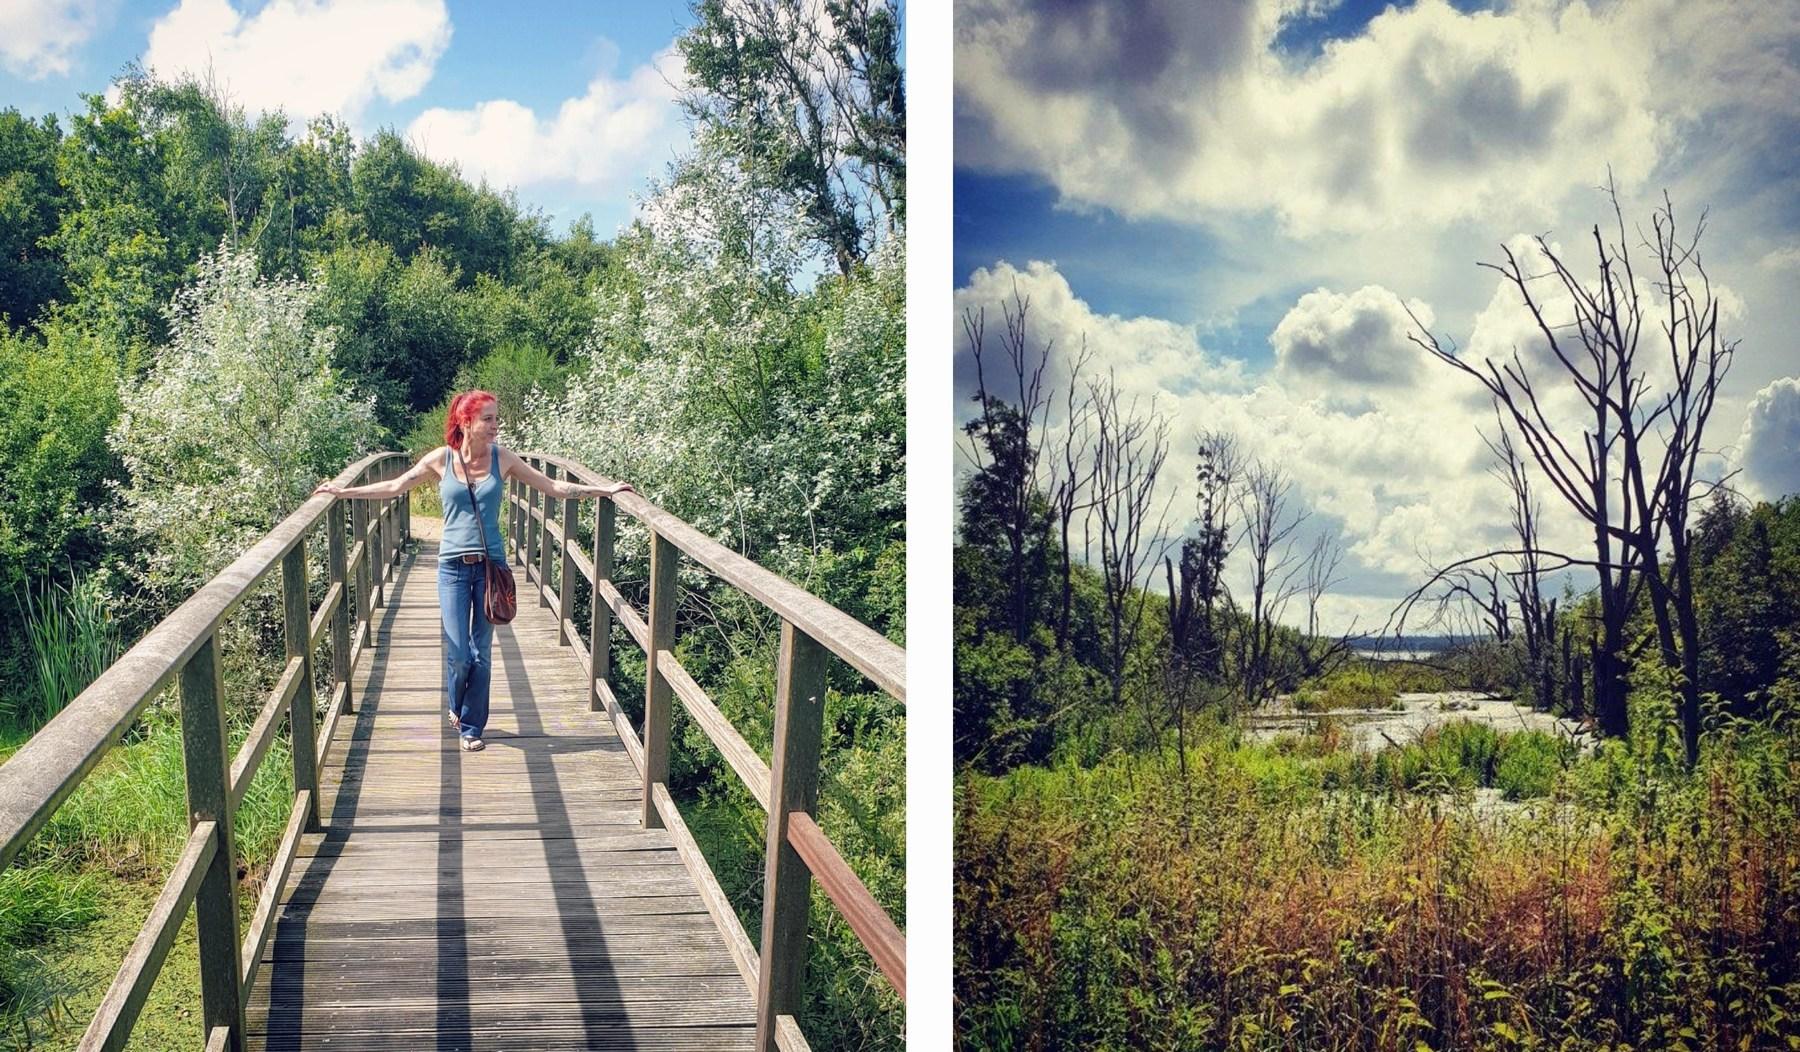 Filsø - Naturschutzgebiet